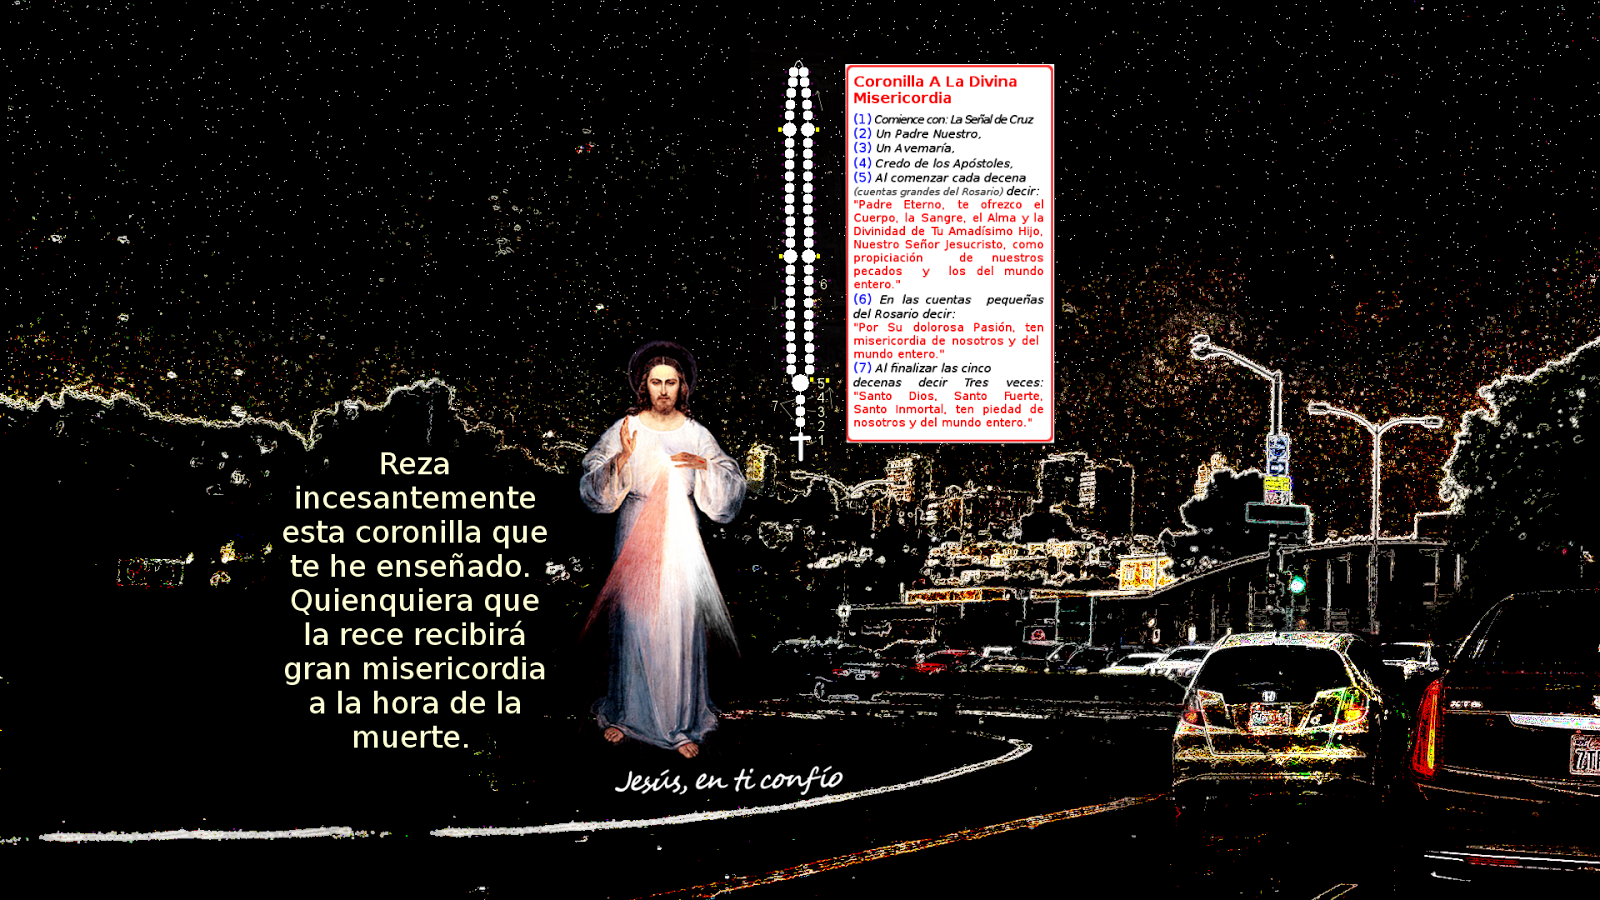 esquema coronilla divina misericordia